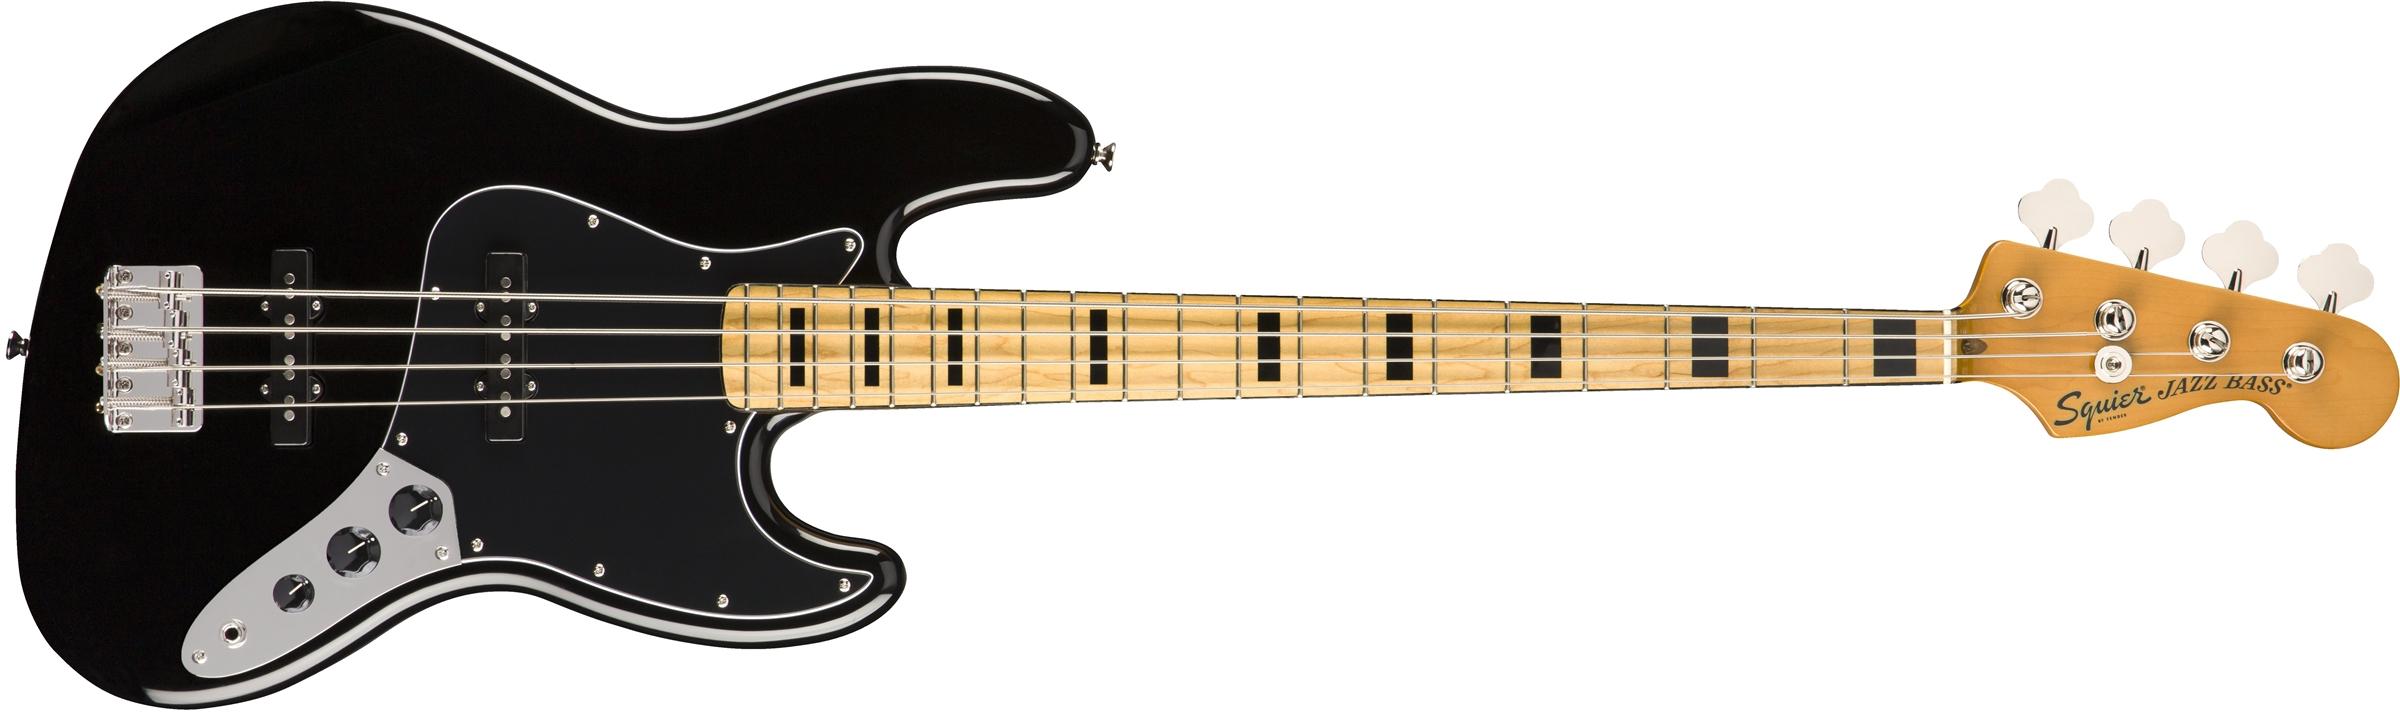 SQUIER Classic Vibe 70s Jazz Bass MN Black  0374540506